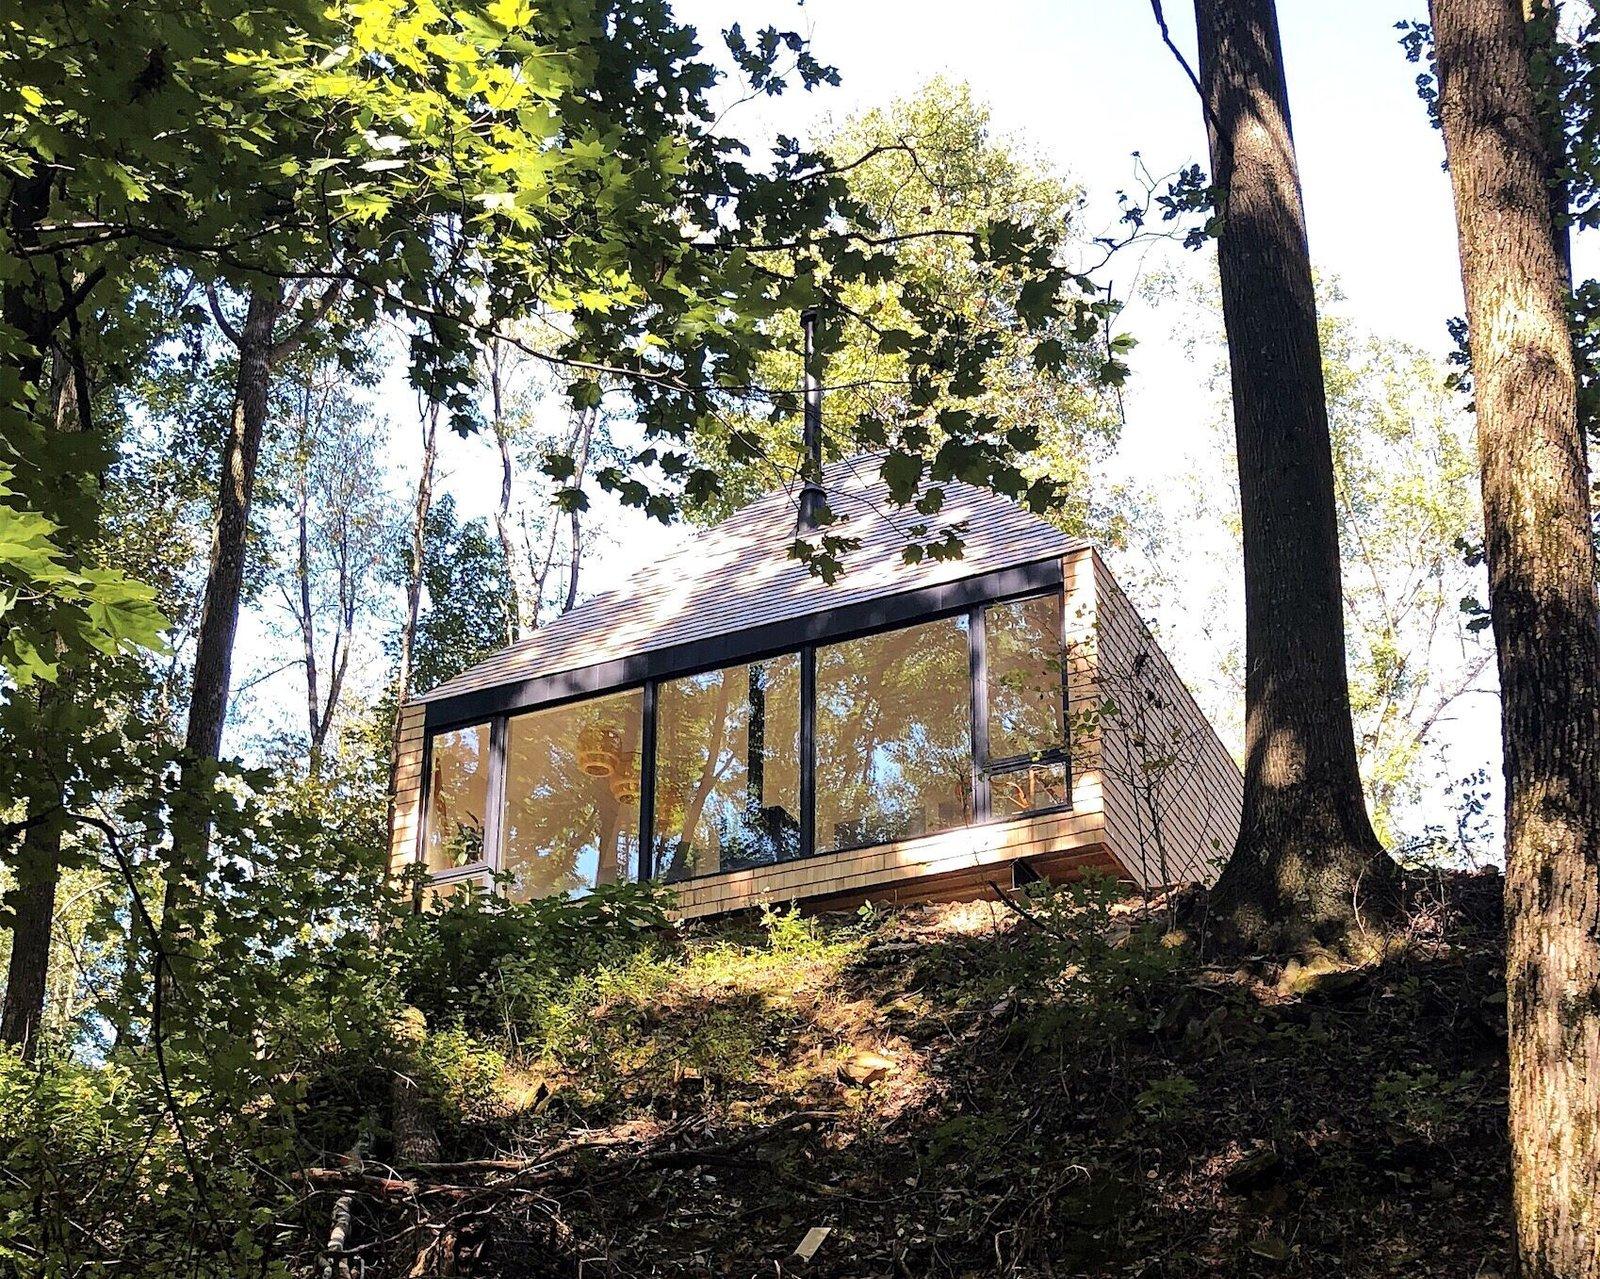 The Hut cedar shingle cabin exterior